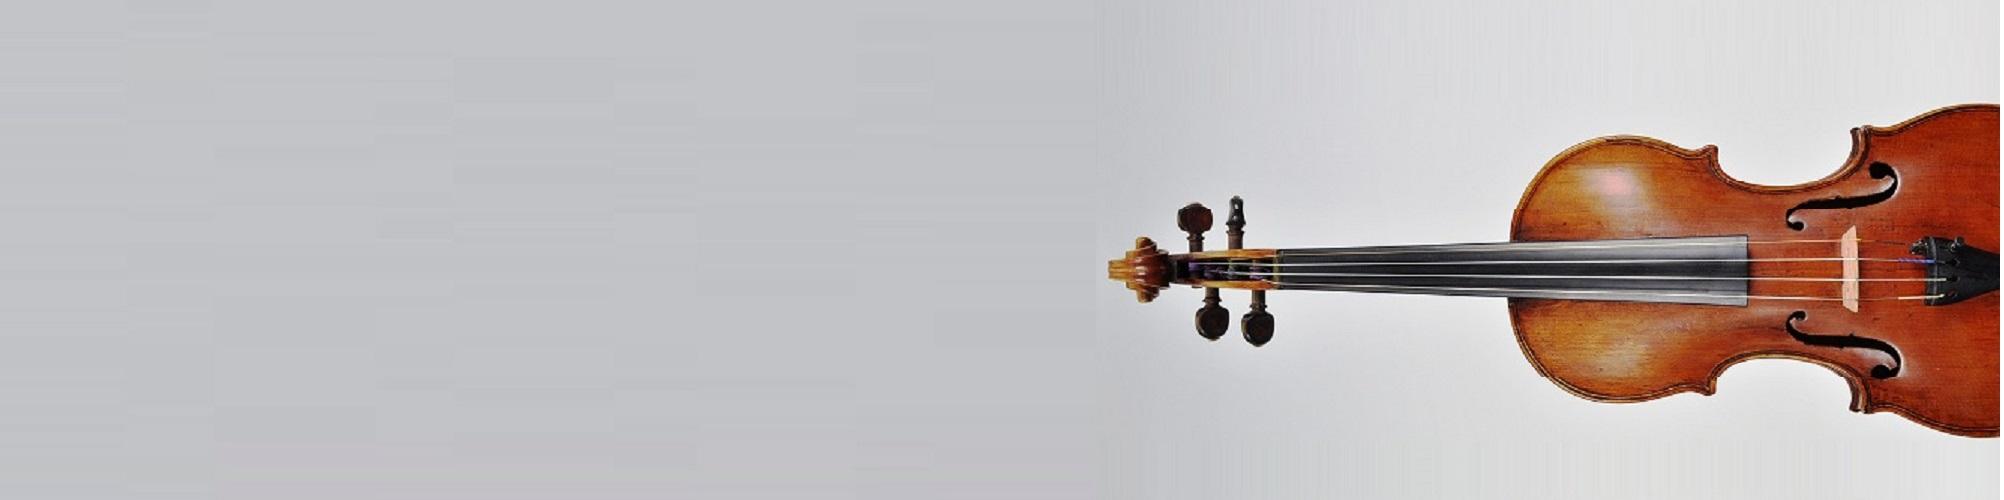 vioolhuren.nl viool